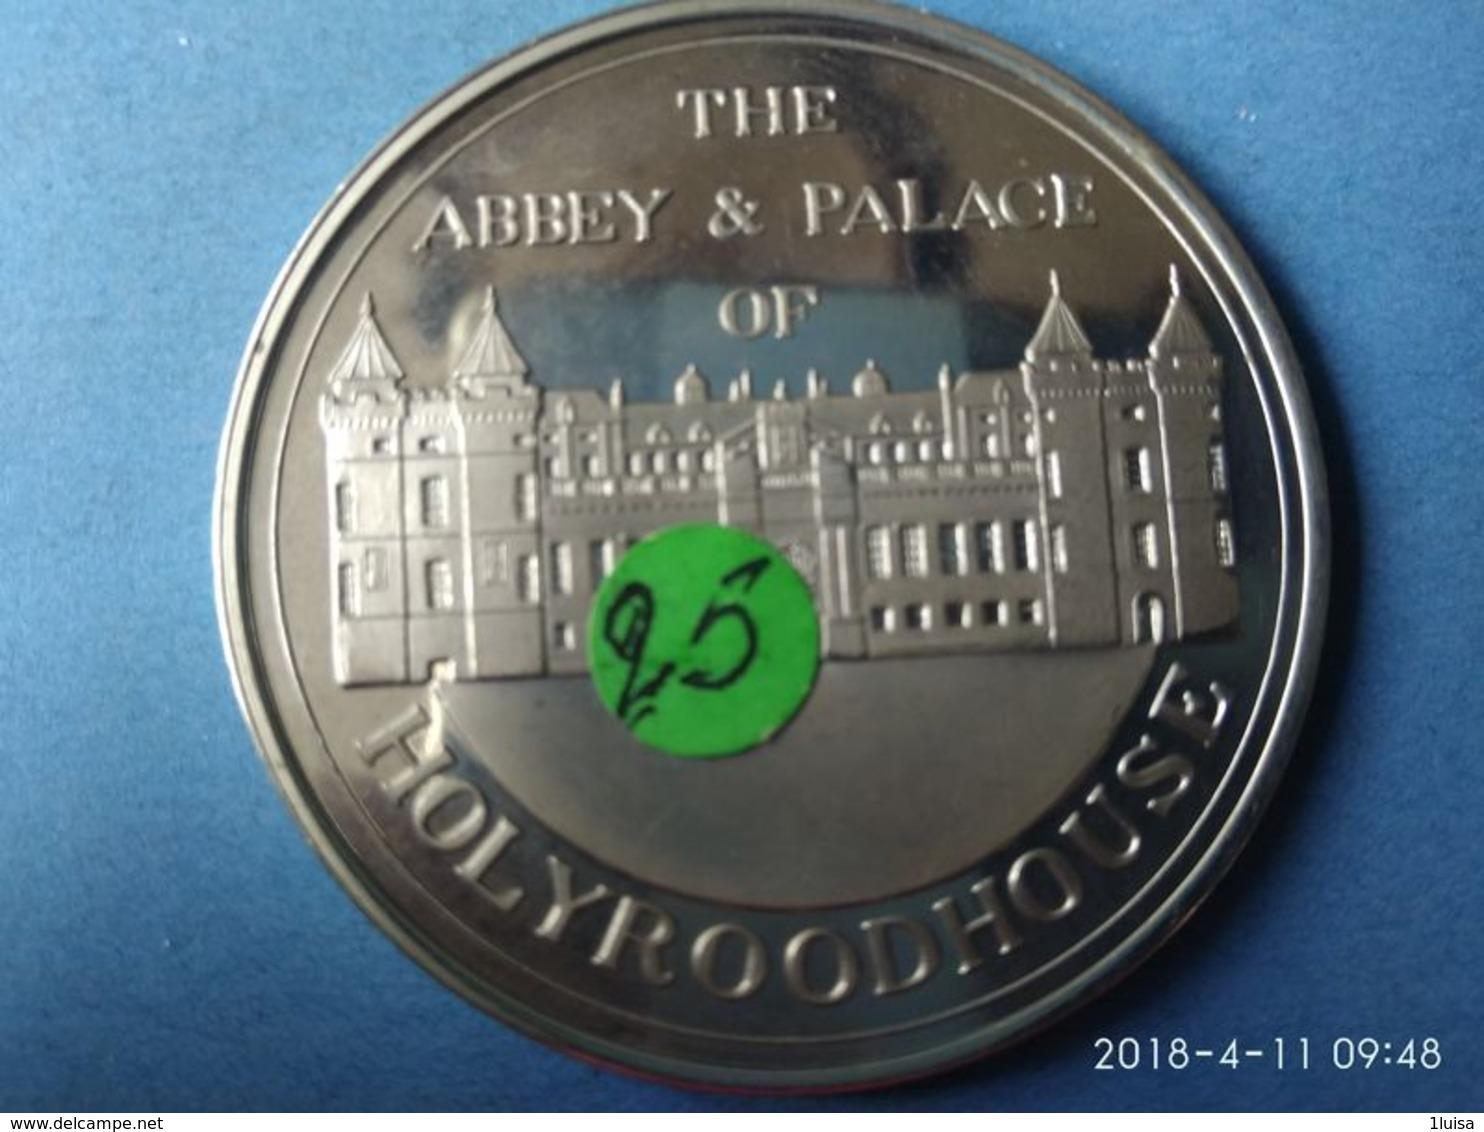 Giubileo D'argento 1952-1977 The Abbey - Palace Of Holyroodhouse - Monarchia/ Nobiltà